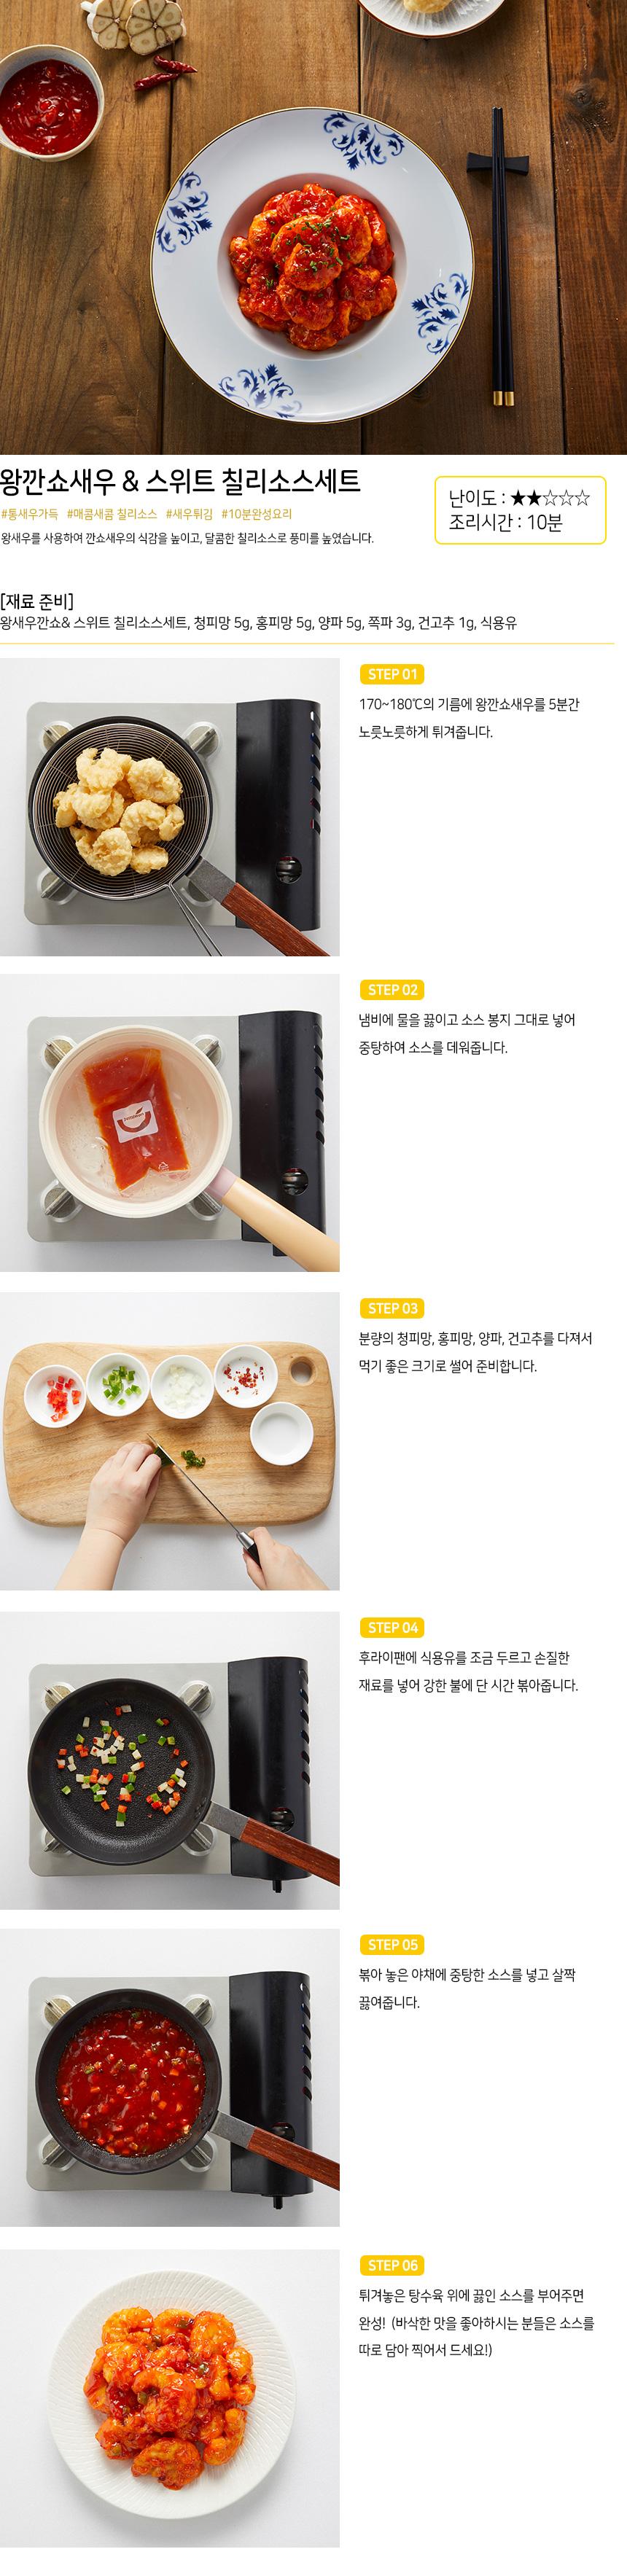 recipe_22120.jpg